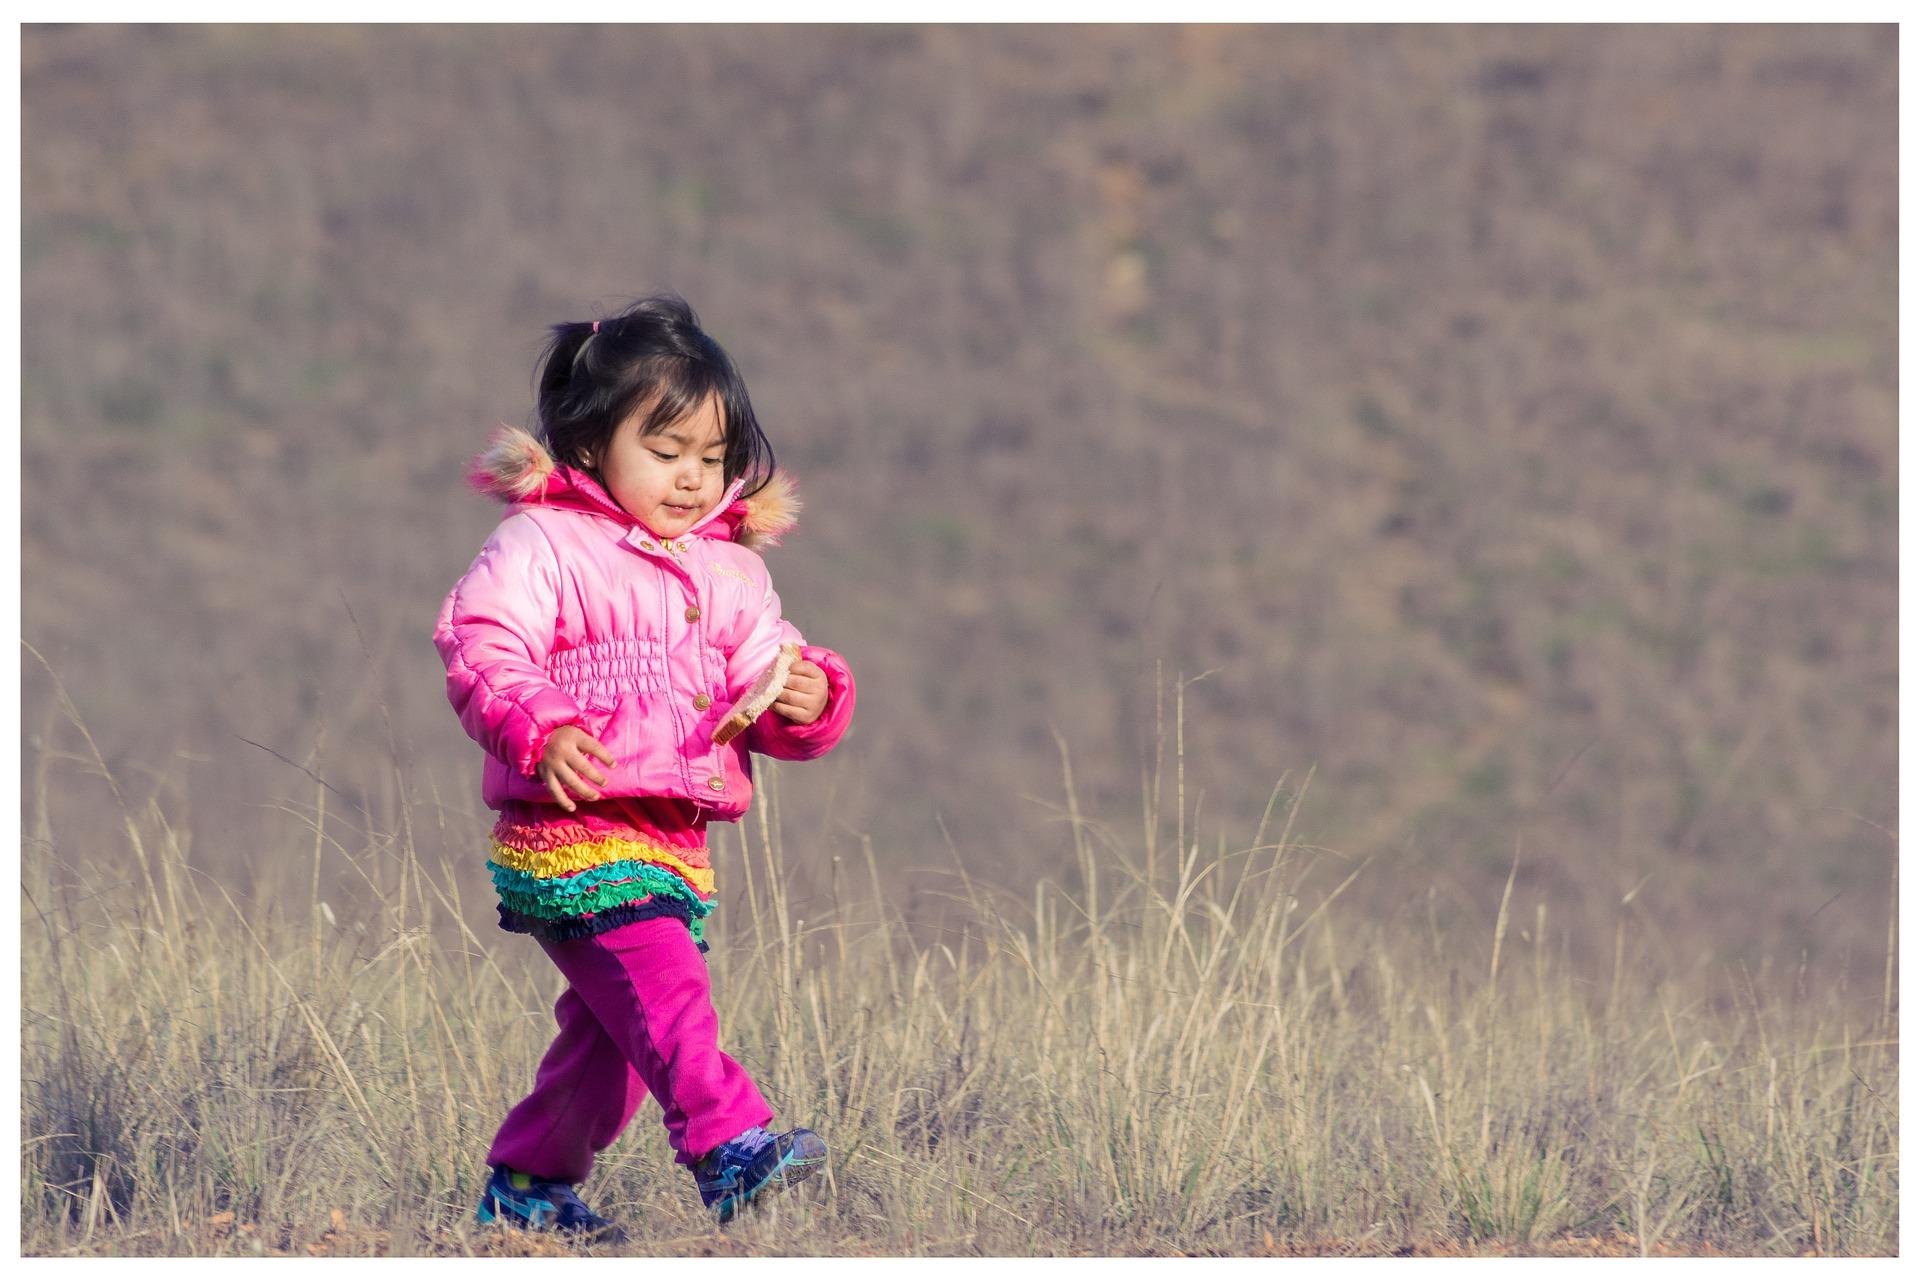 walking- girl591202_1920.jpg